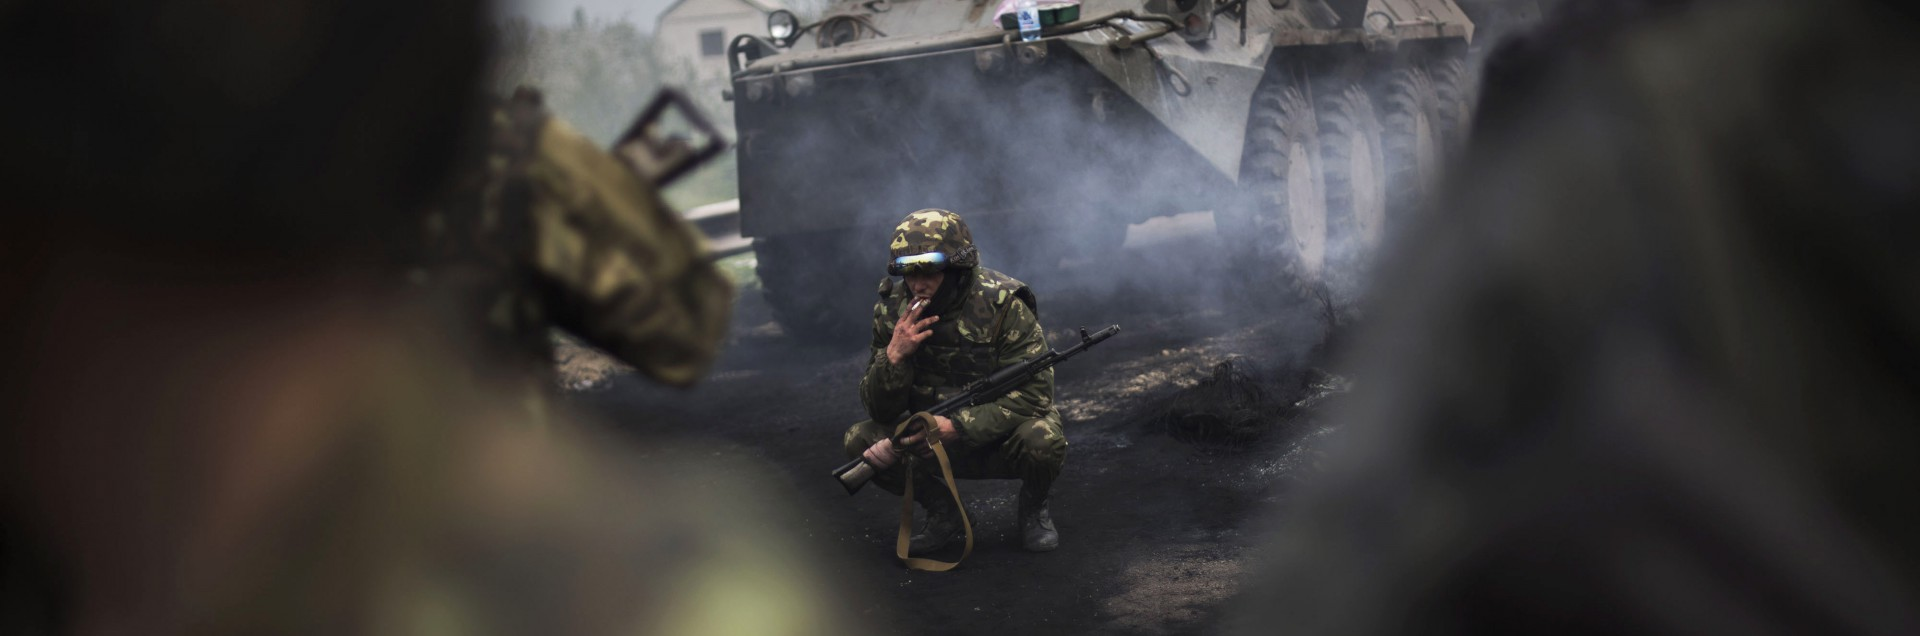 Elicotteri colpiti, in Ucraina è guerra